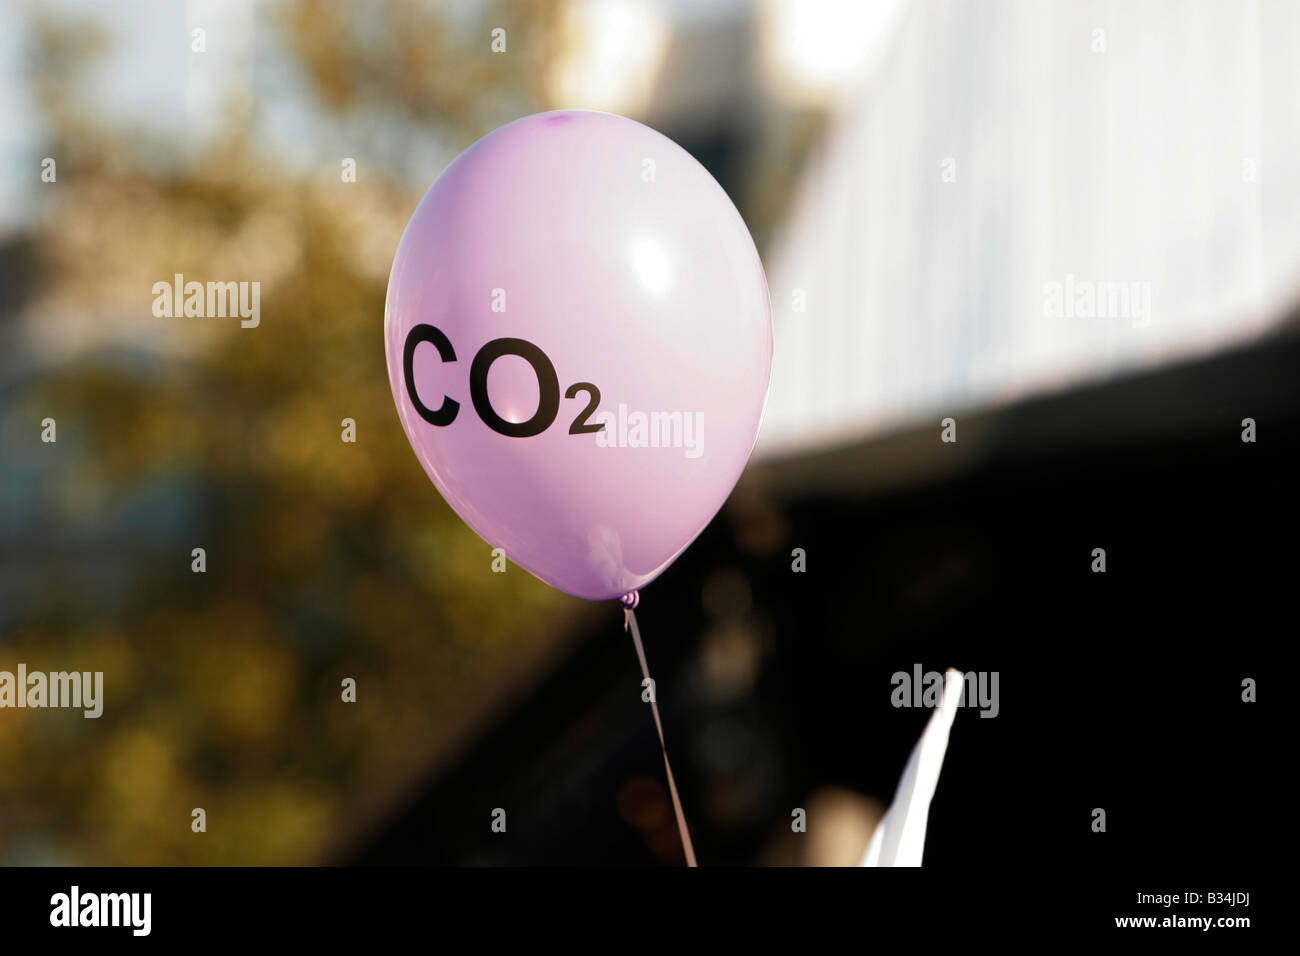 C02 balloon, I Count Stop Climate Chaos Rally Trafalgar Square London - Stock Image